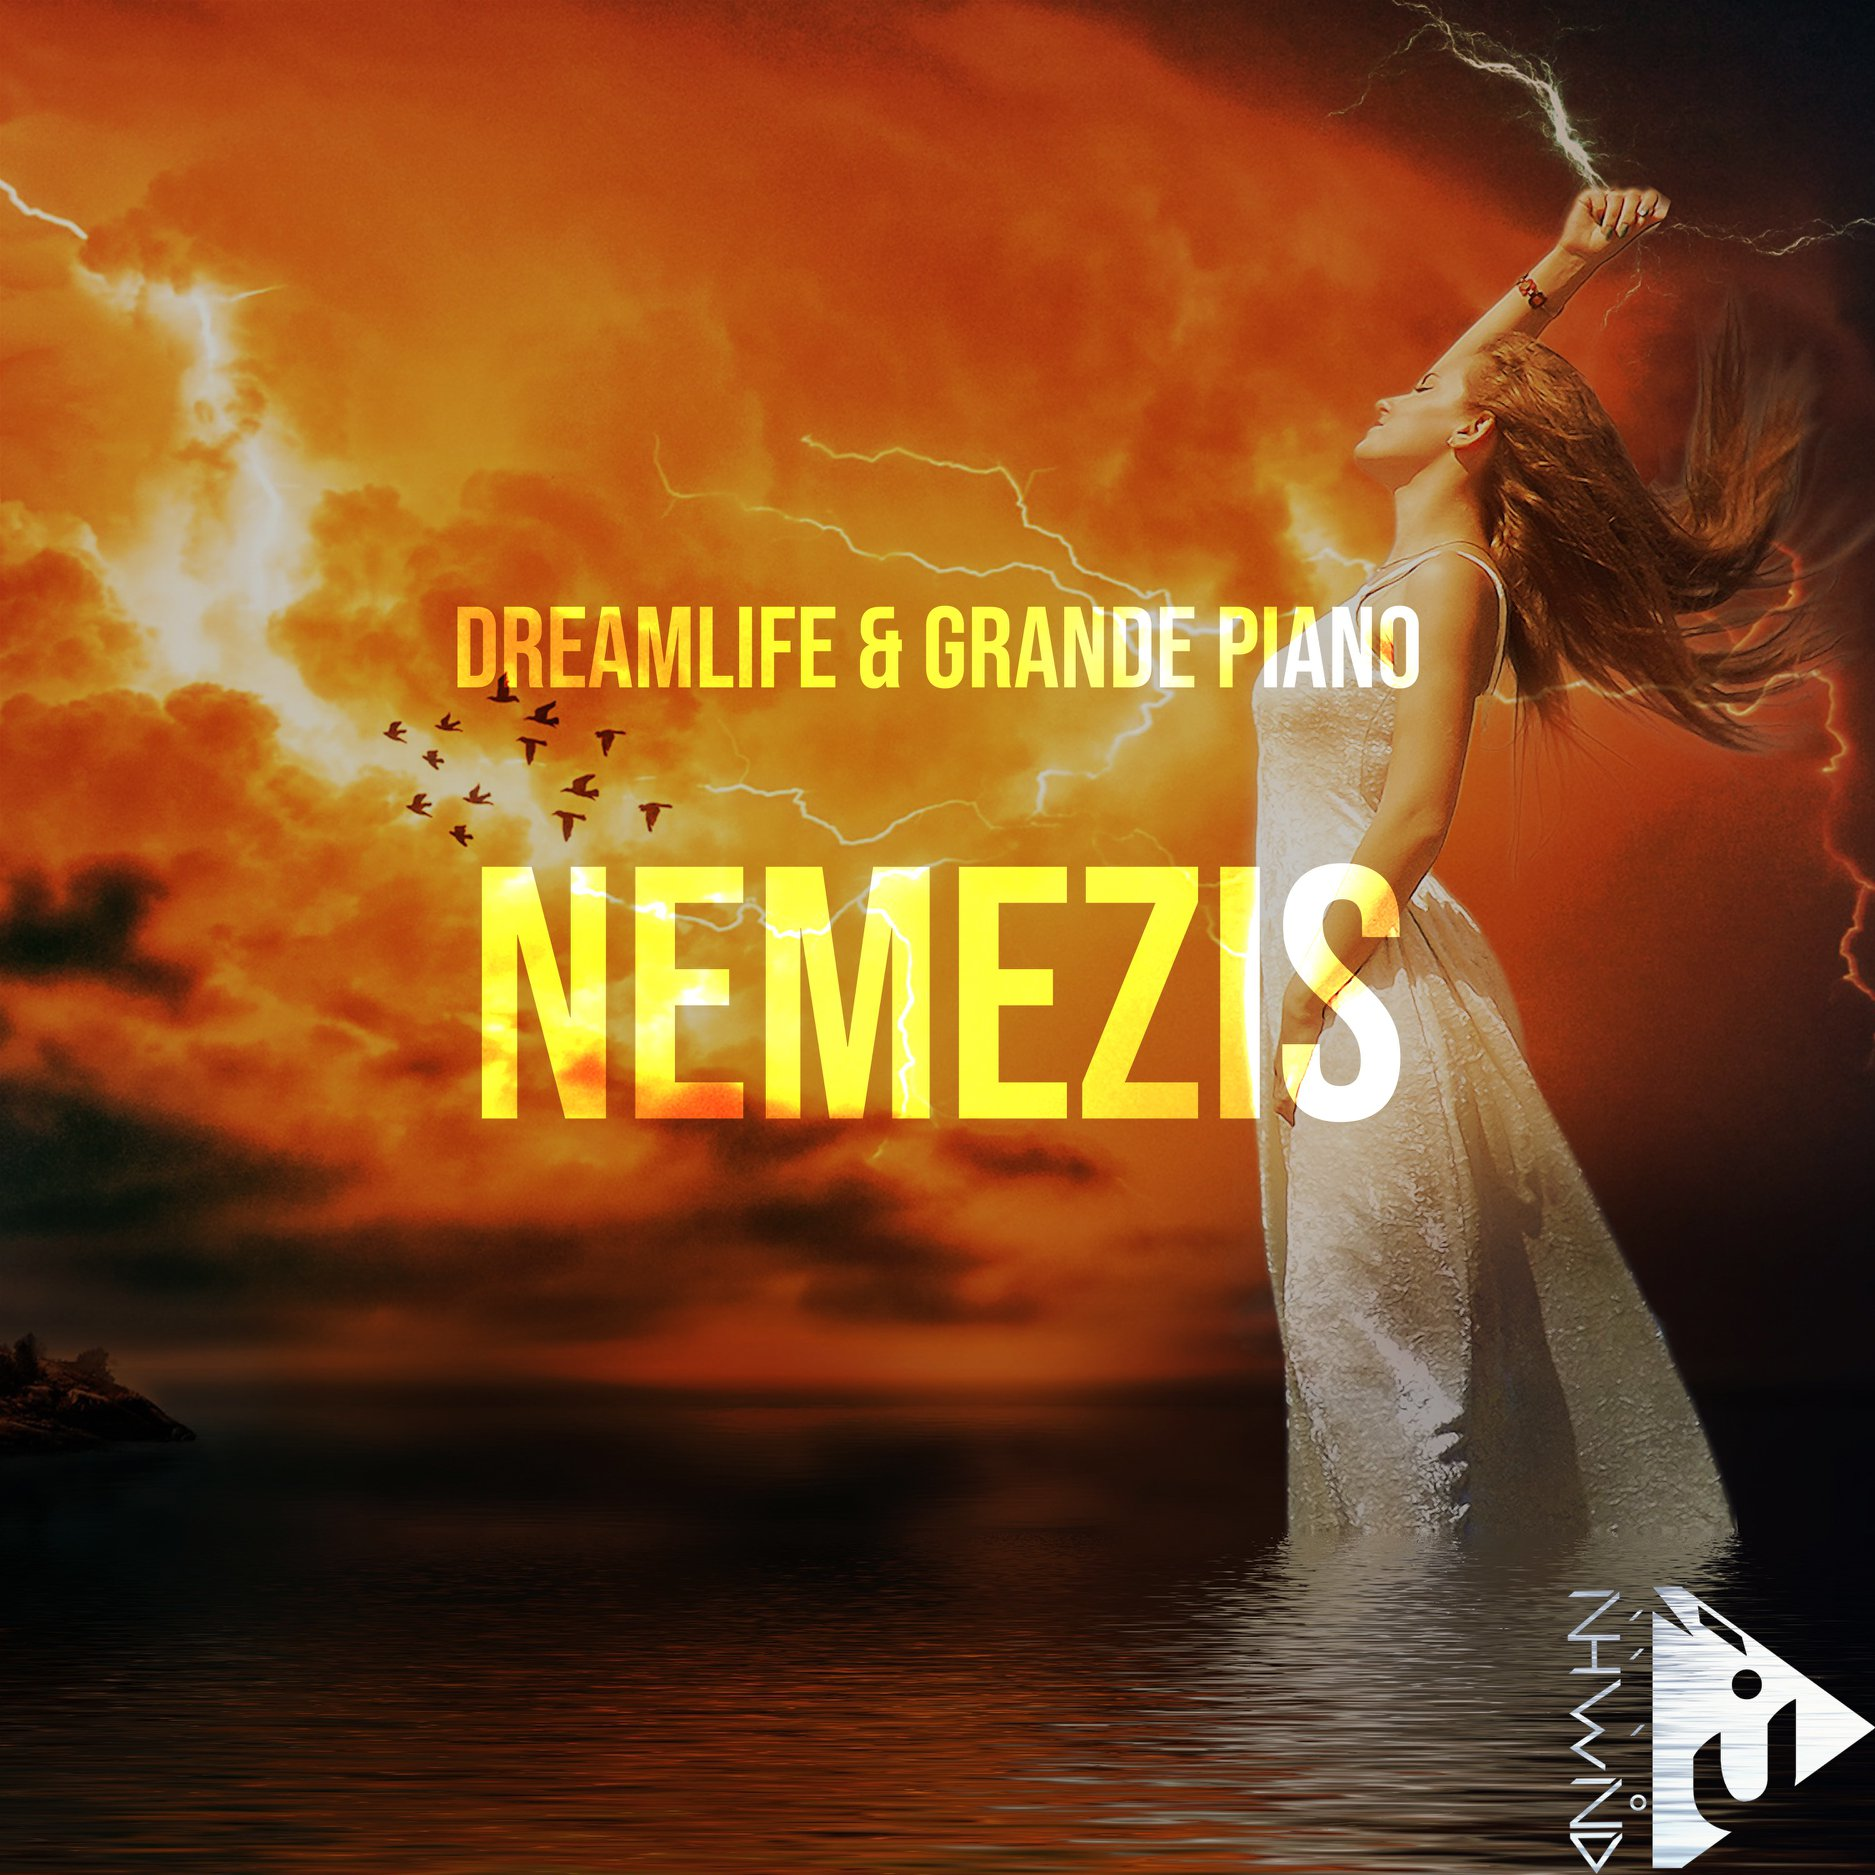 DreamLife & Grande Piano - Nemezis